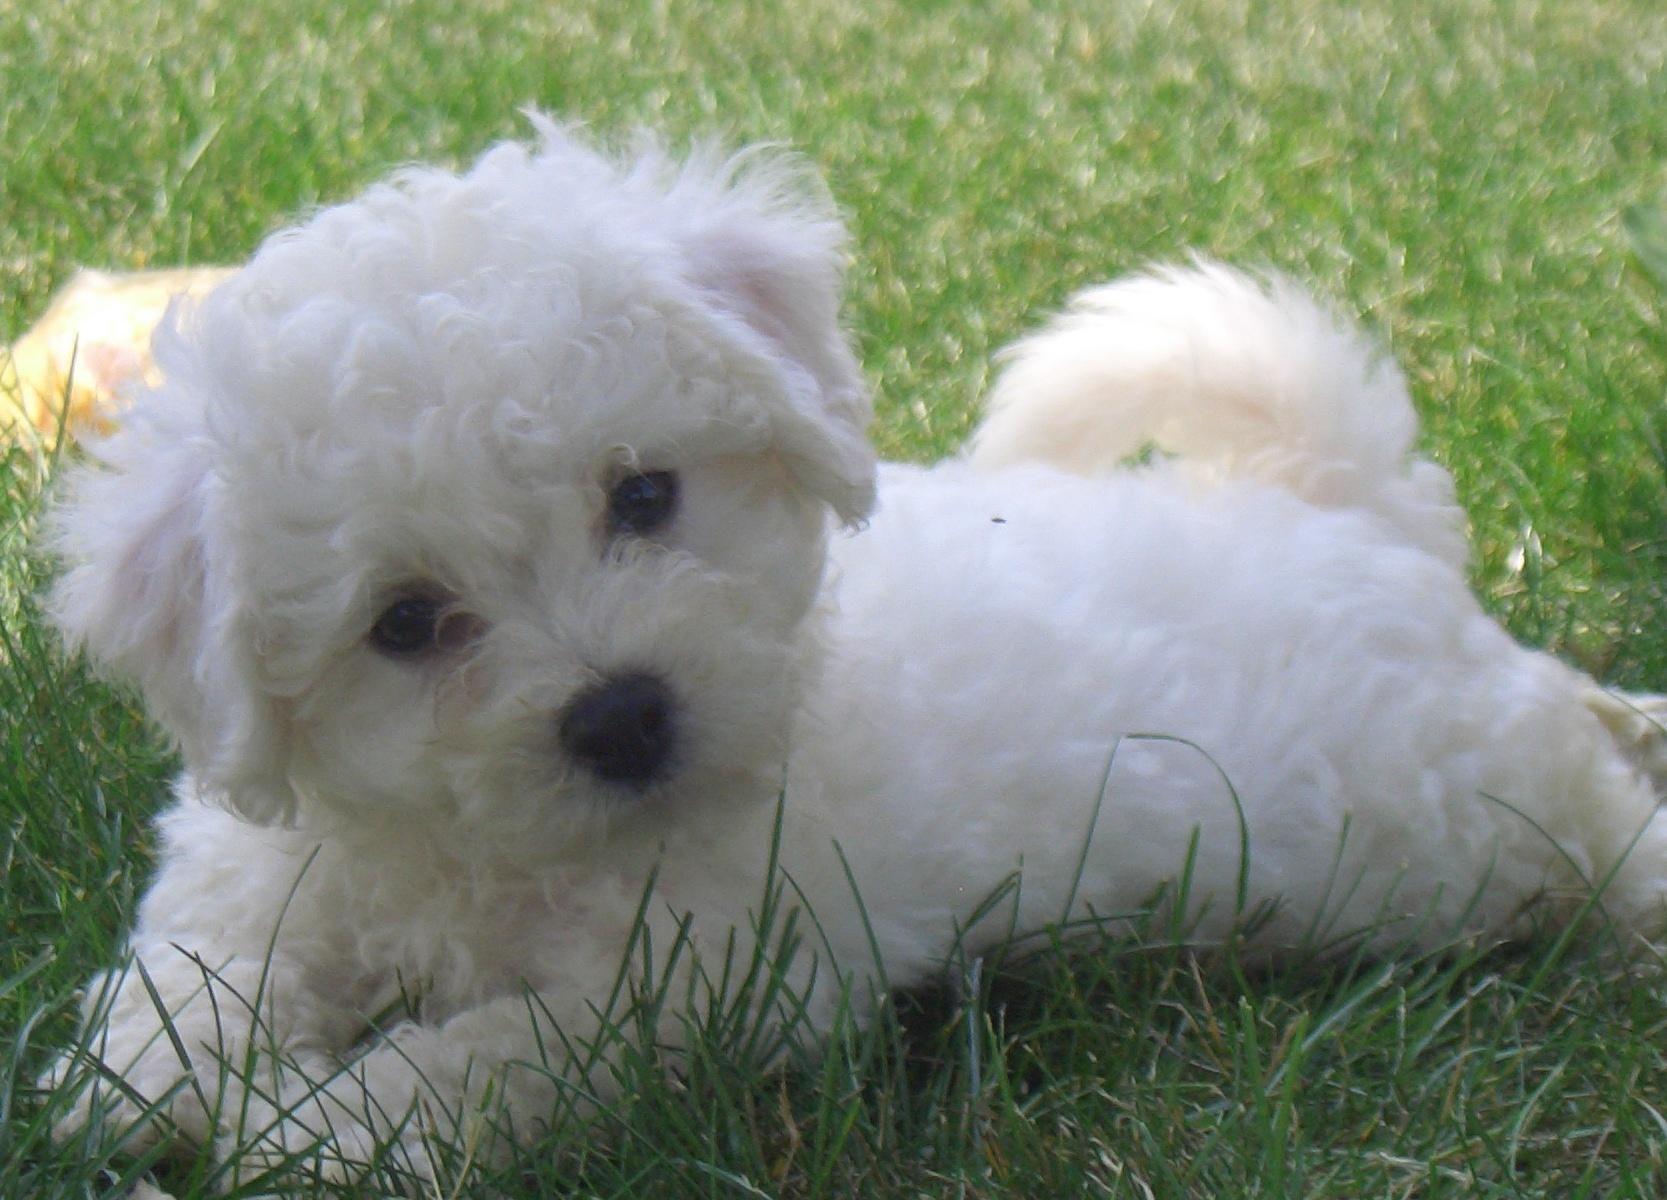 Bishon Frise Puppy Miniature Bichon Frise 1750352 Hd Wallpaper Backgrounds Download